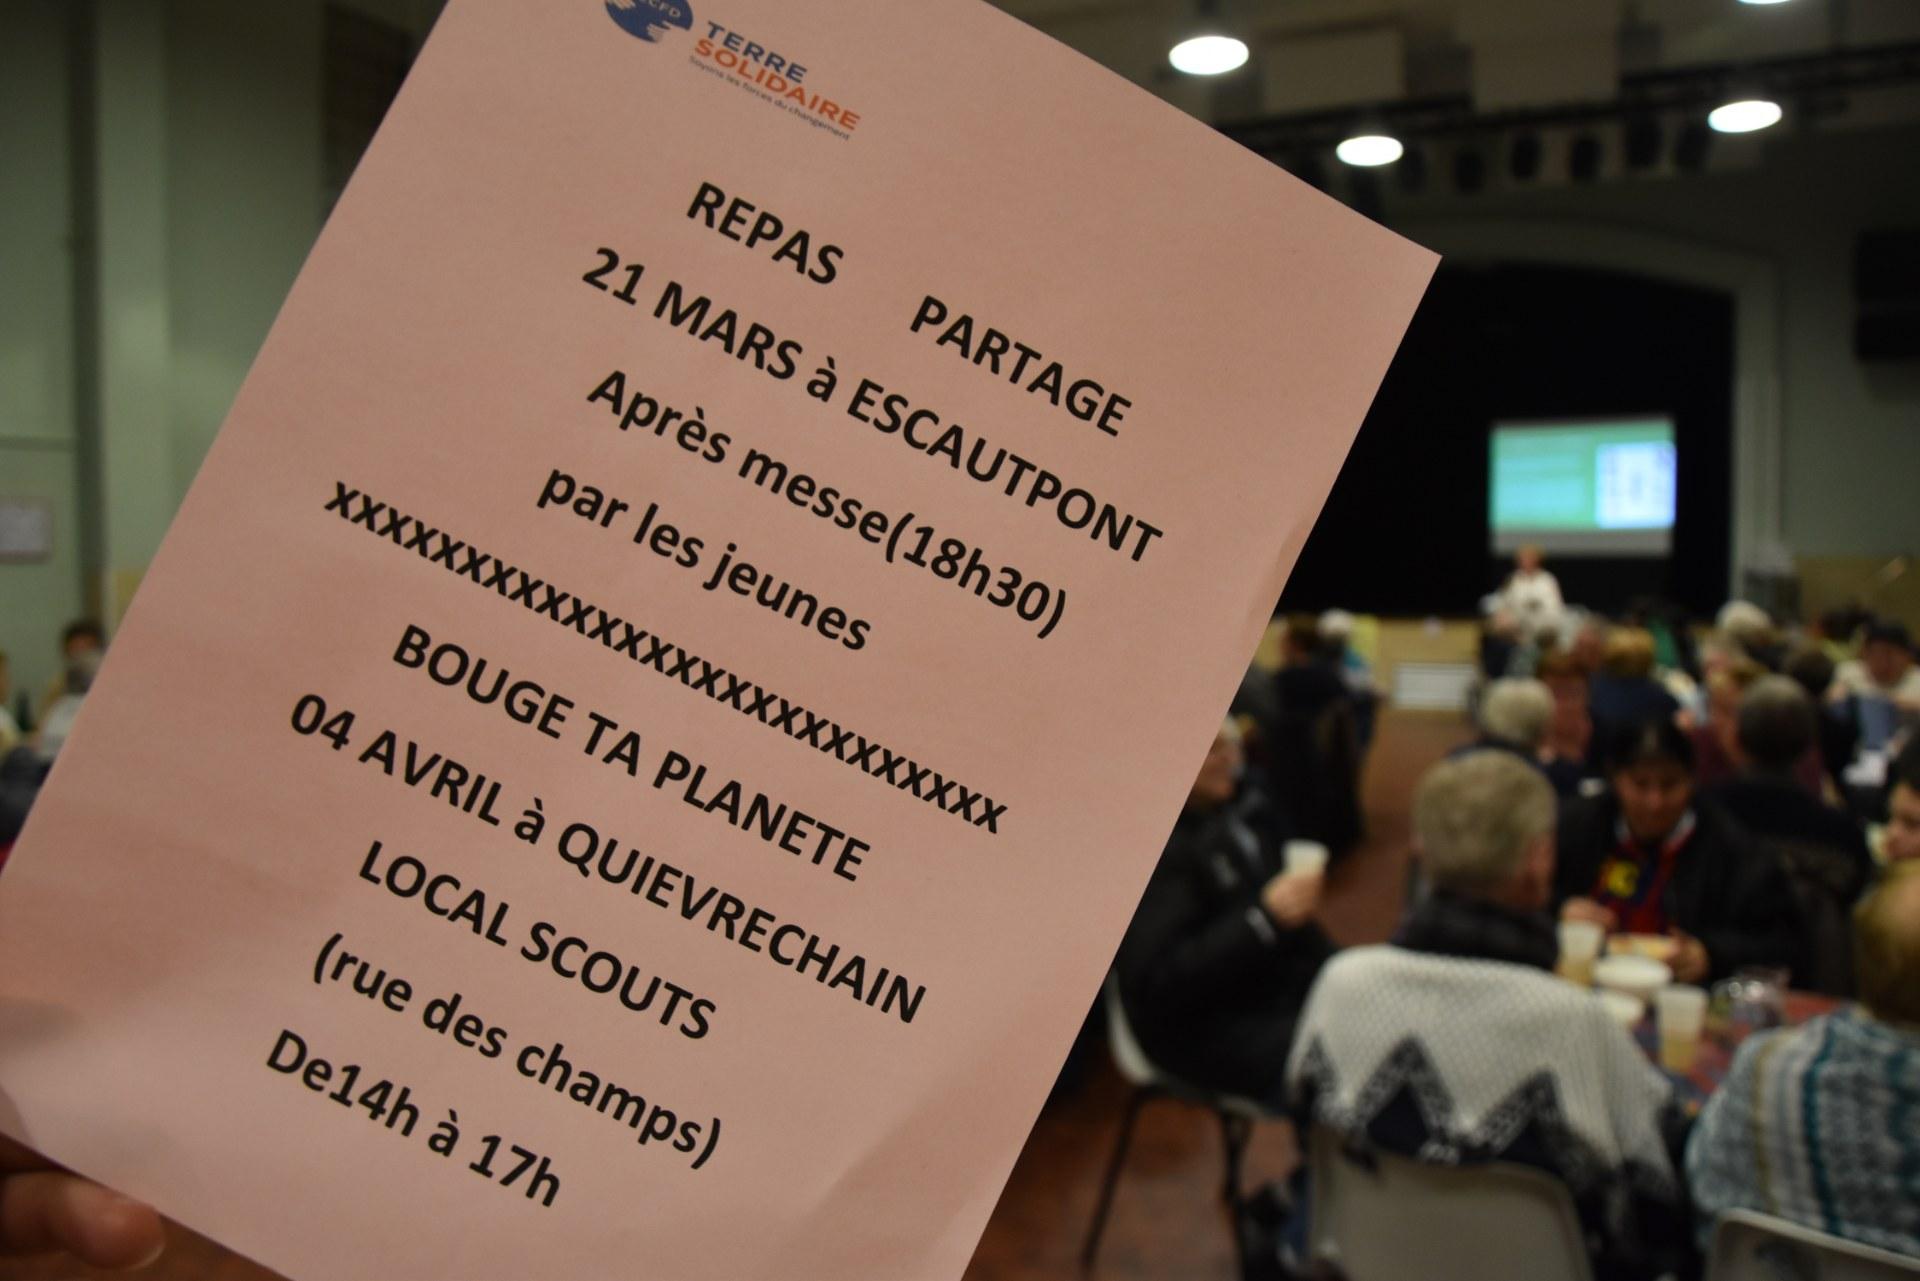 Mardi gras en doyenné 2020 51